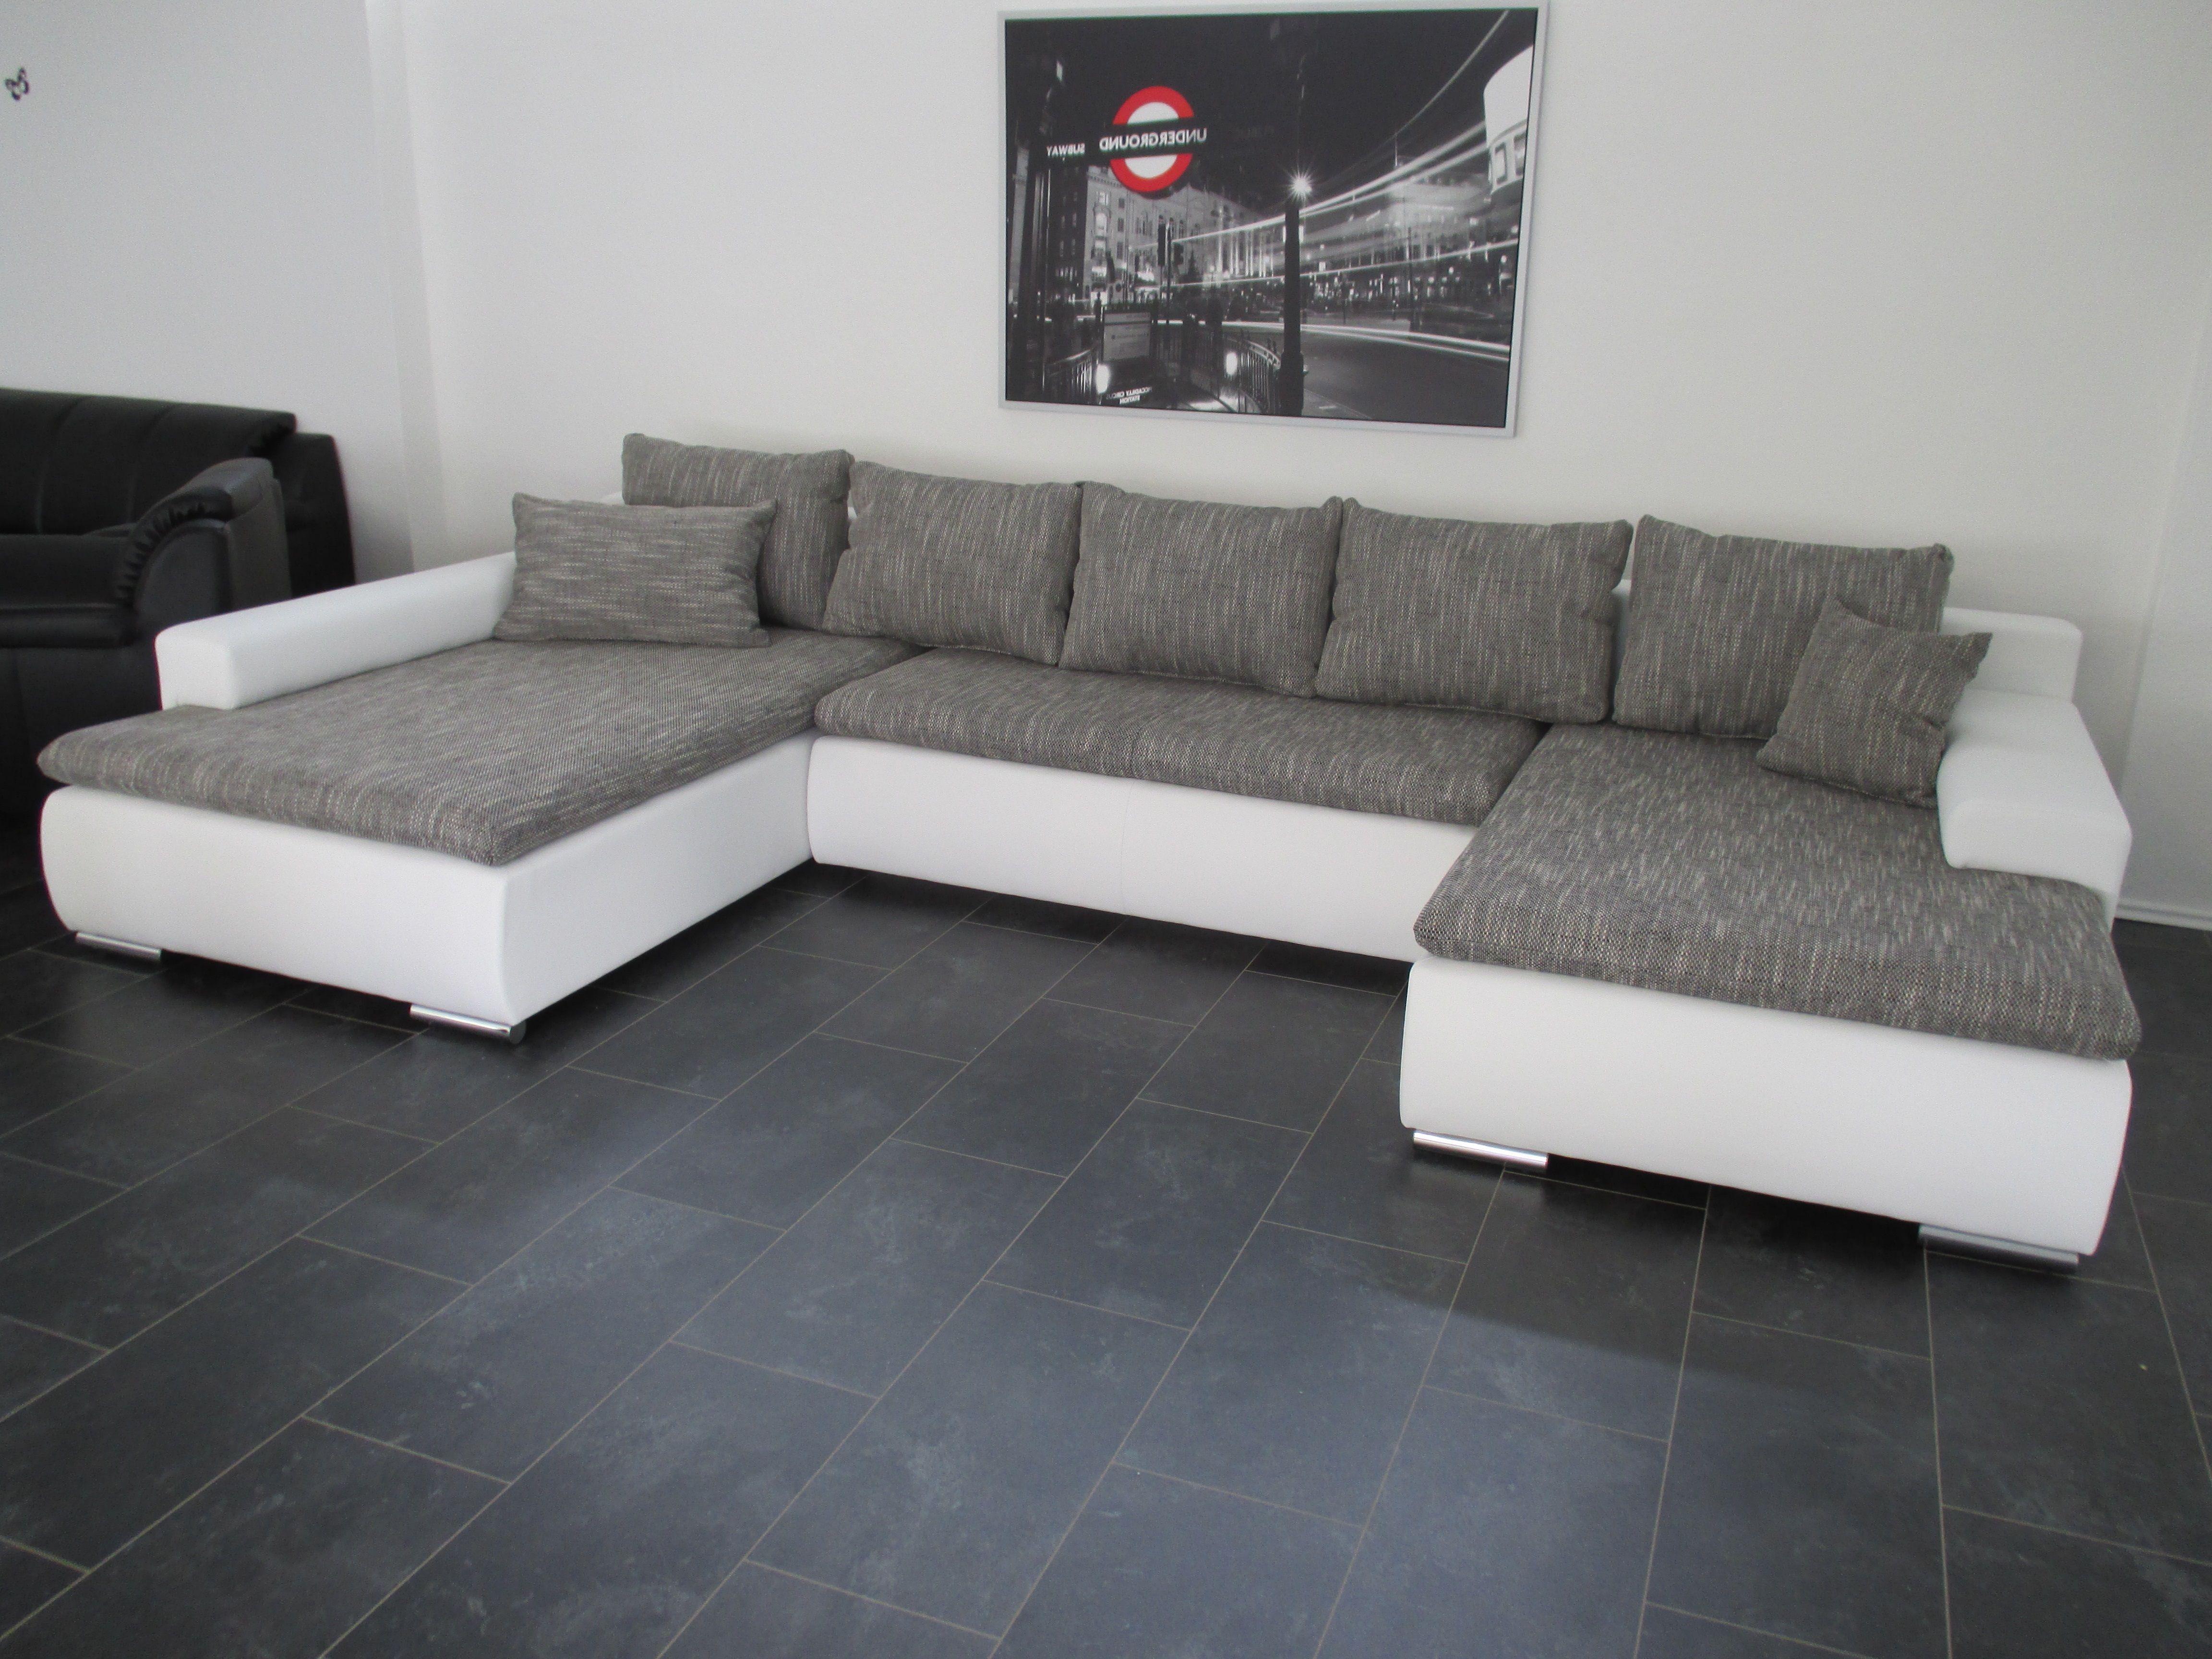 Sofa Lagerverkauf Fabrikverkauf Elkenroth Polstermobel